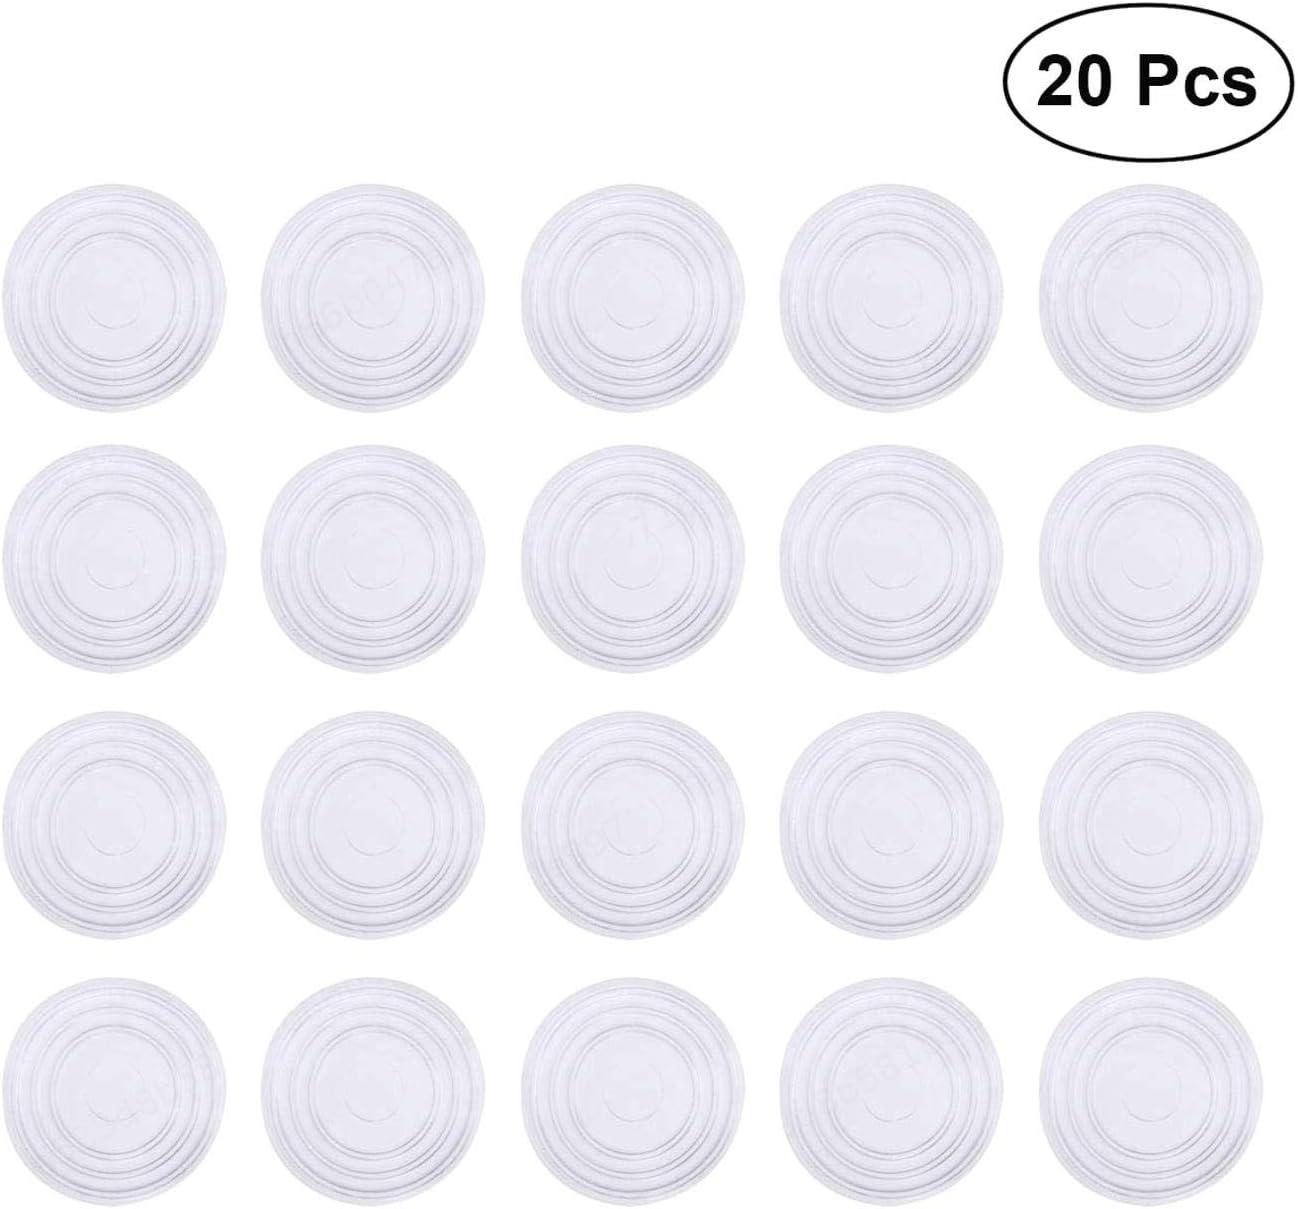 20pcs de Silicona DeoMeat Muebles Pies Antideslizantes Pad para Proteger el Piso de Vidrio